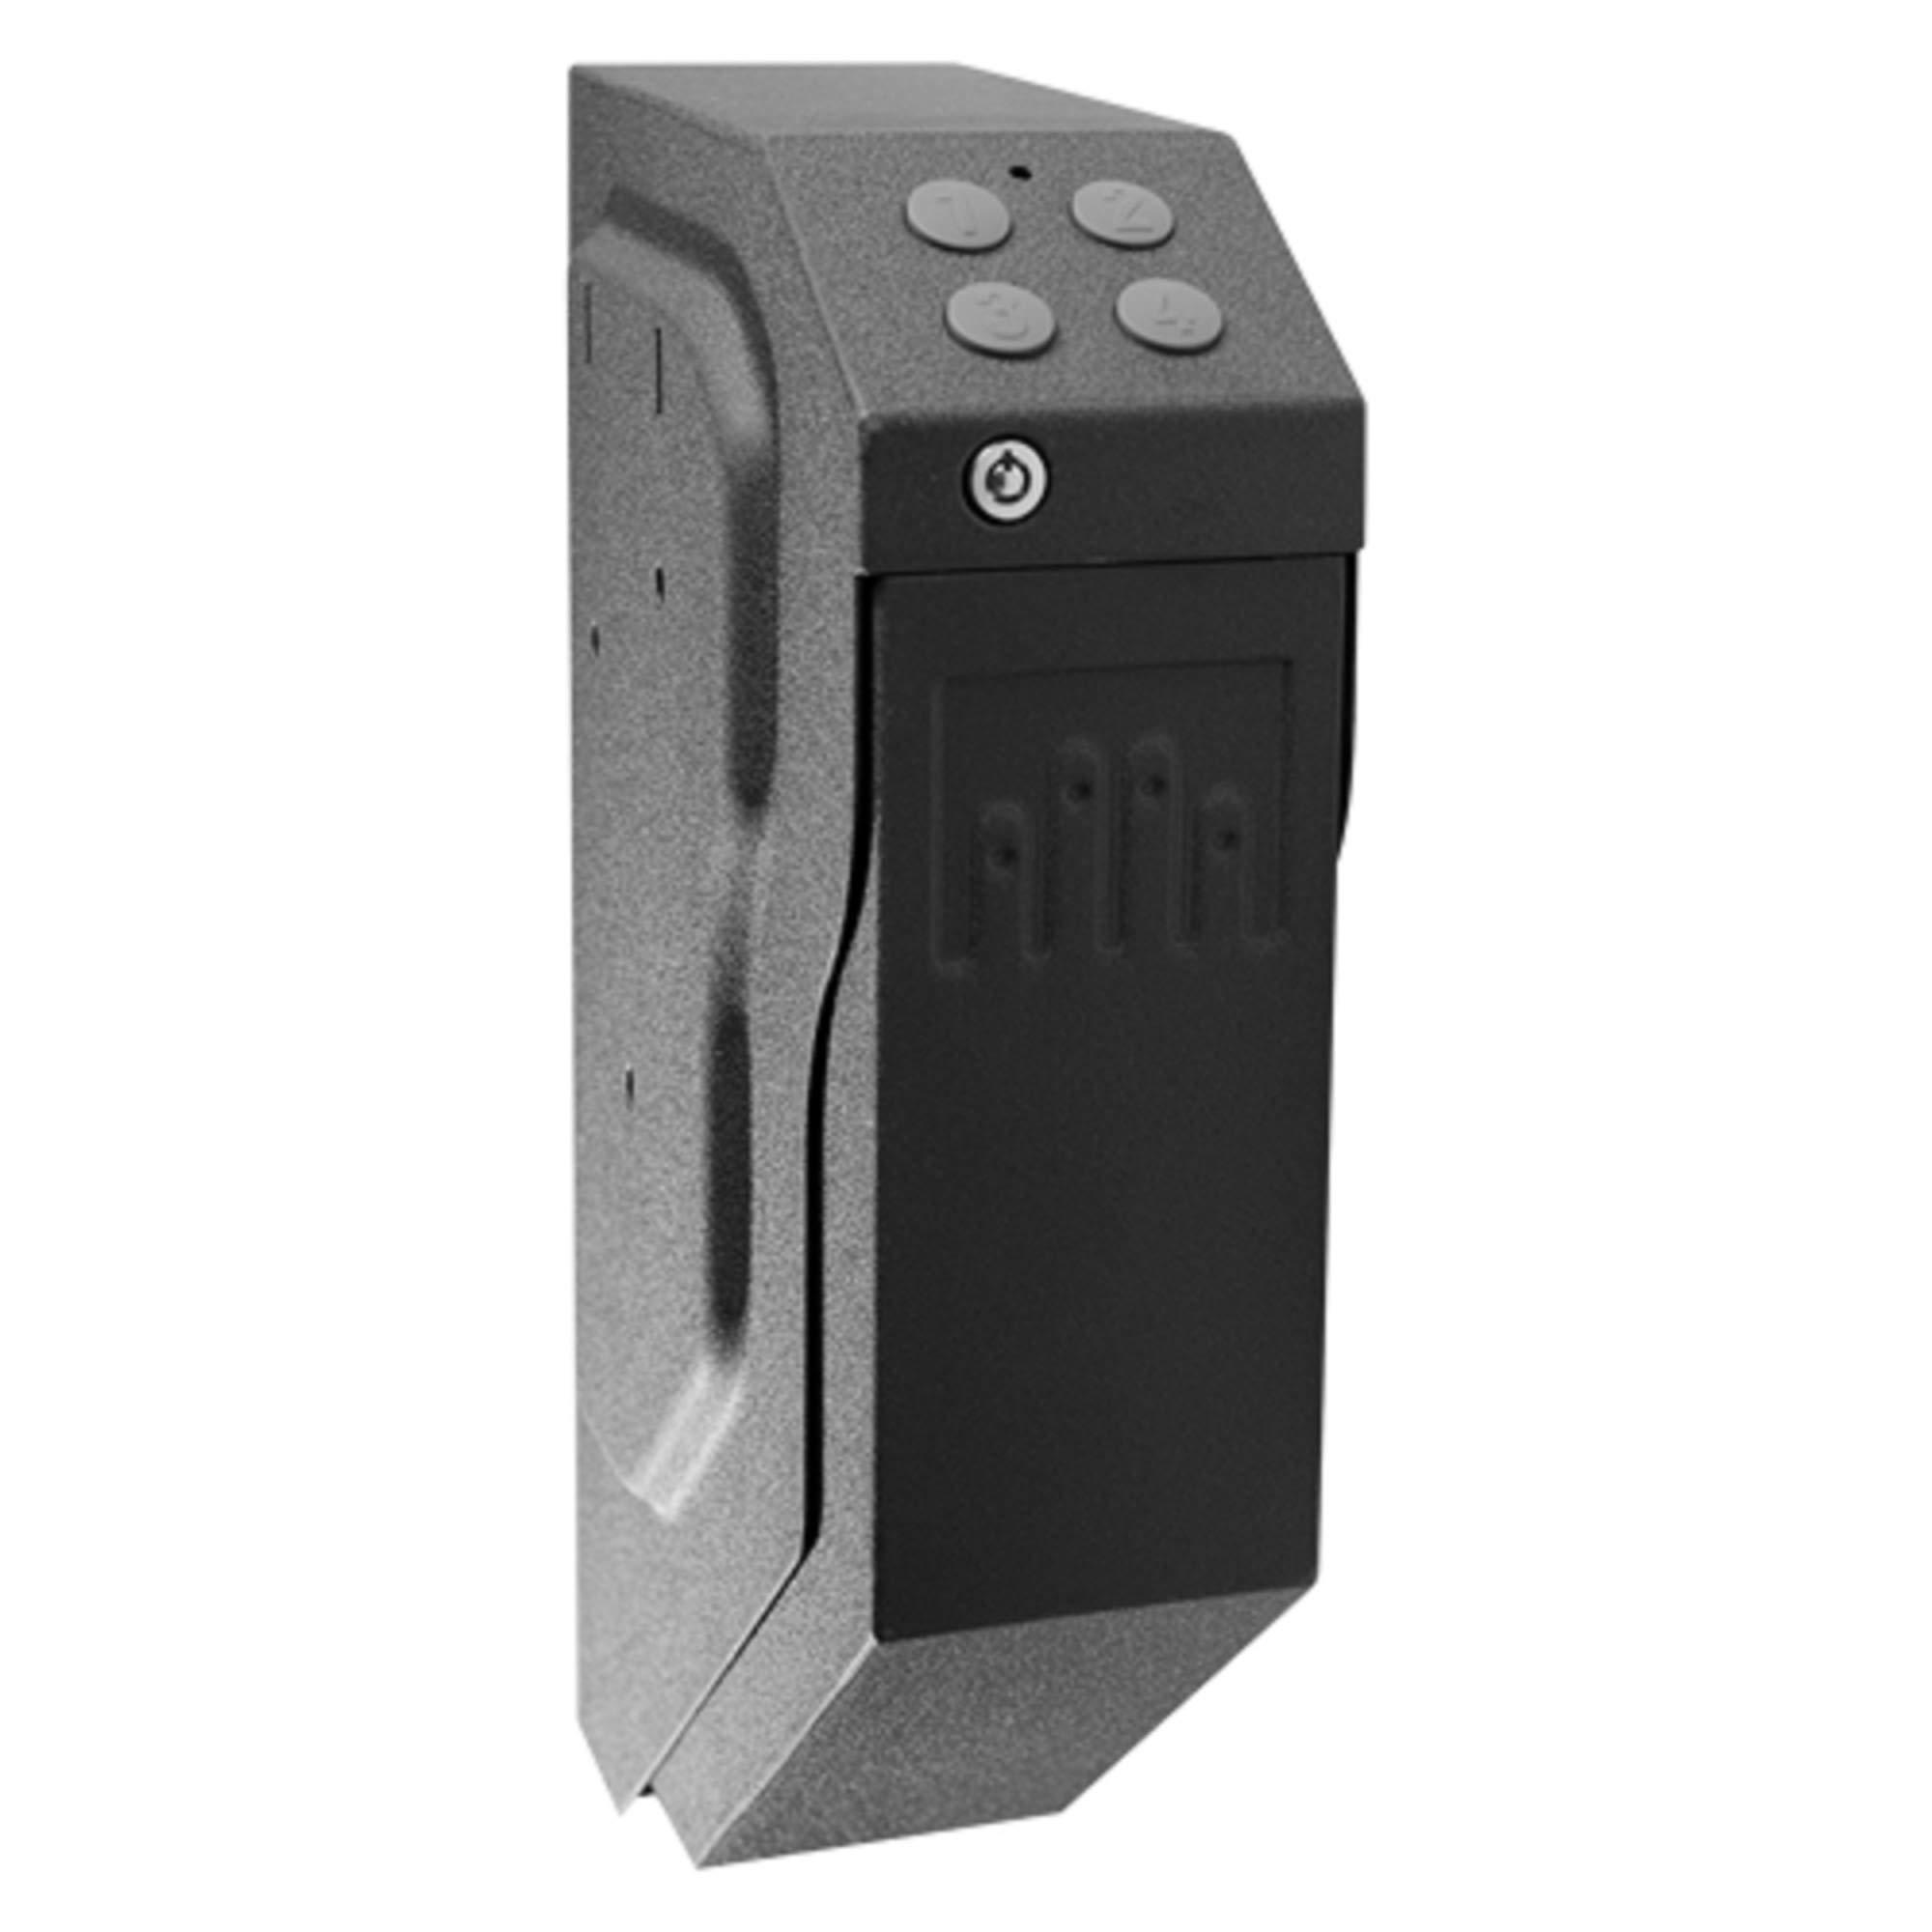 GunVault SV500 - SpeedVault Handgun Safe by GunVault